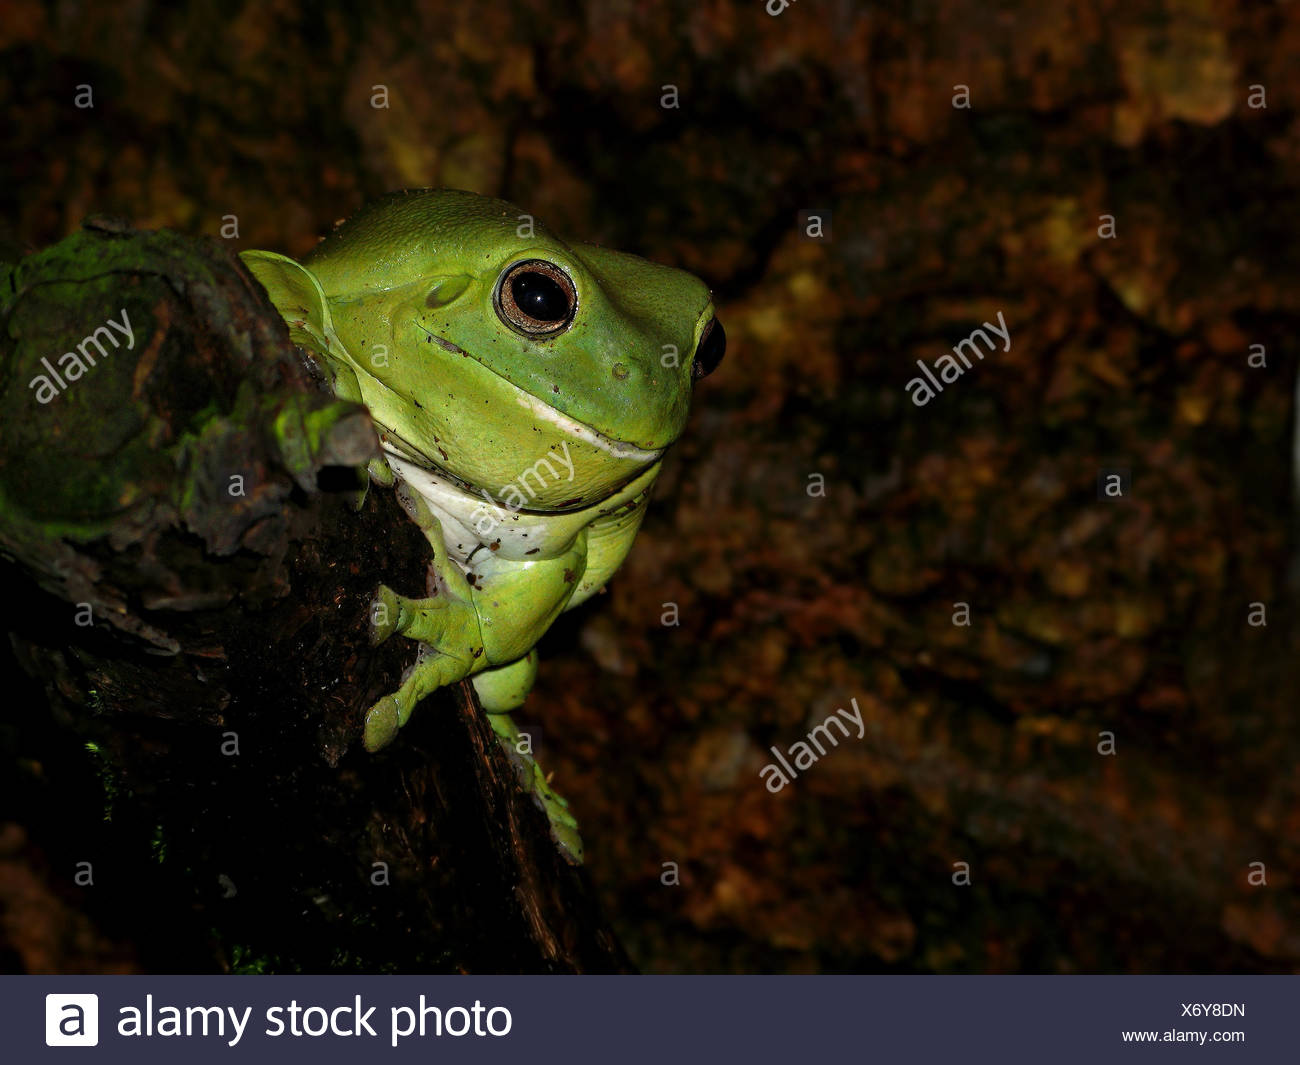 Amphibian Green Australia Frog Terrarium Rise Climb Climbing Ascend